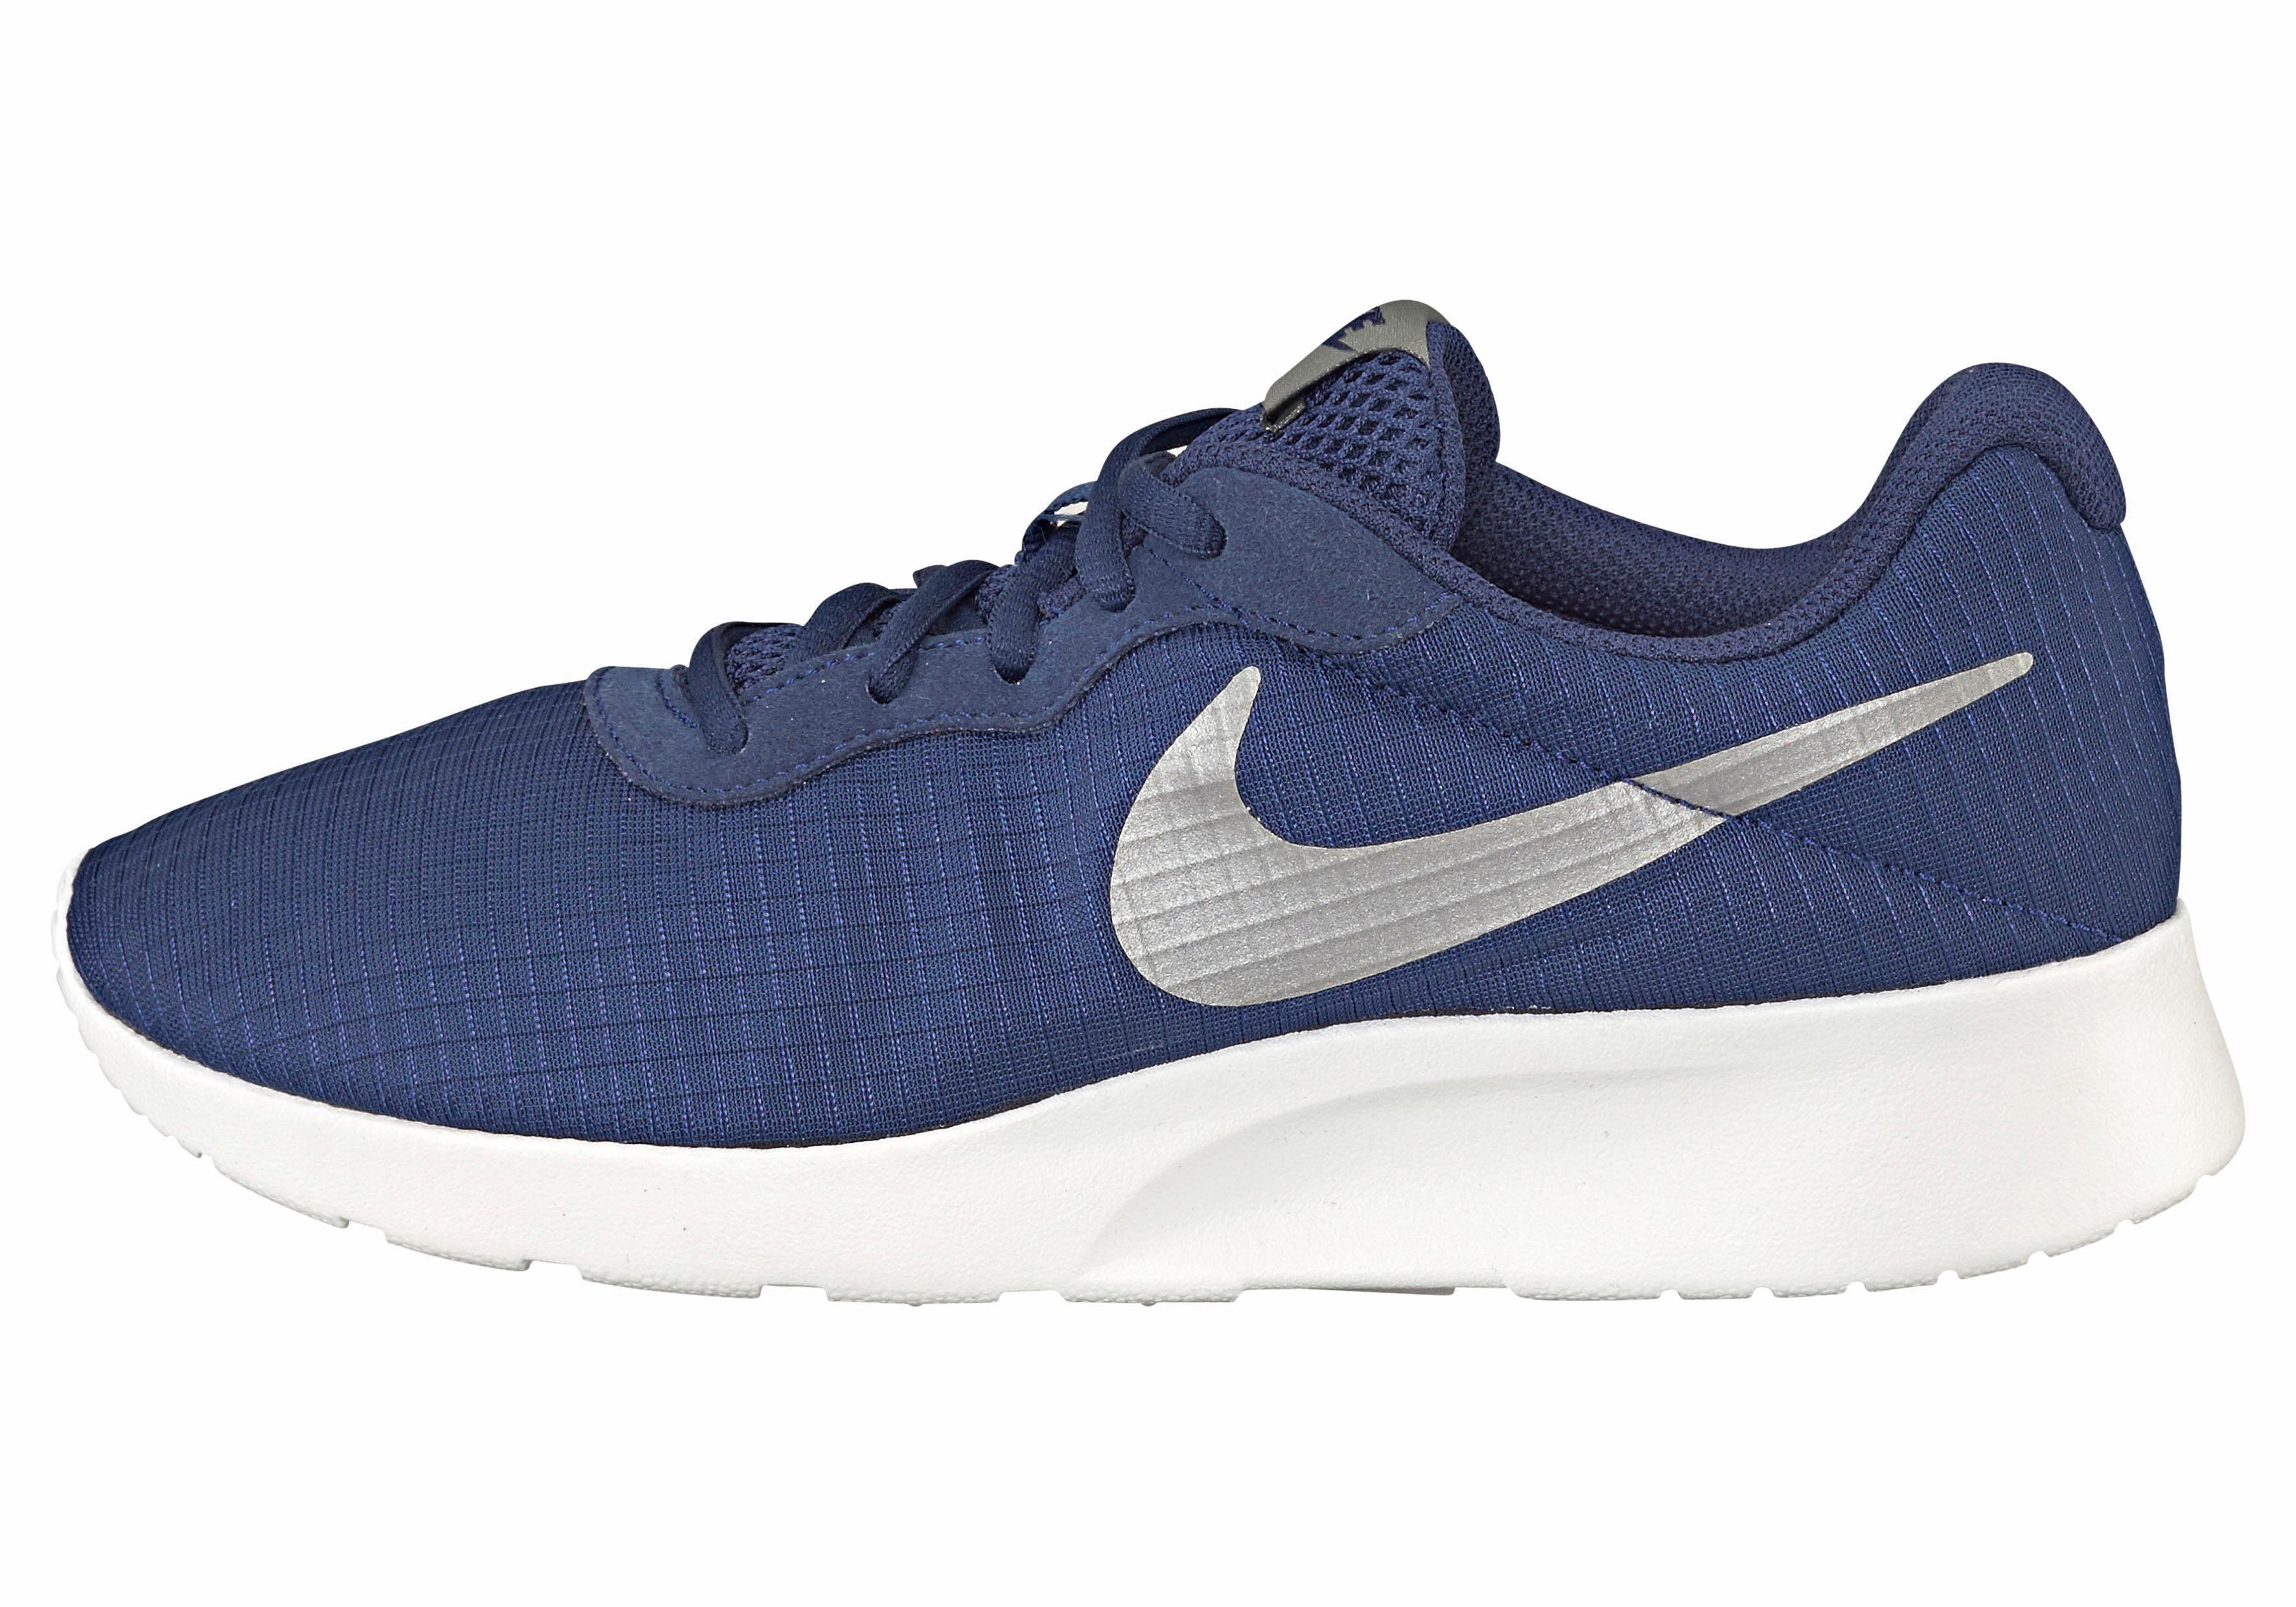 Nike Chaussures De Sport Laag 'wmns Tanjun Se' Marine GqXhplic6